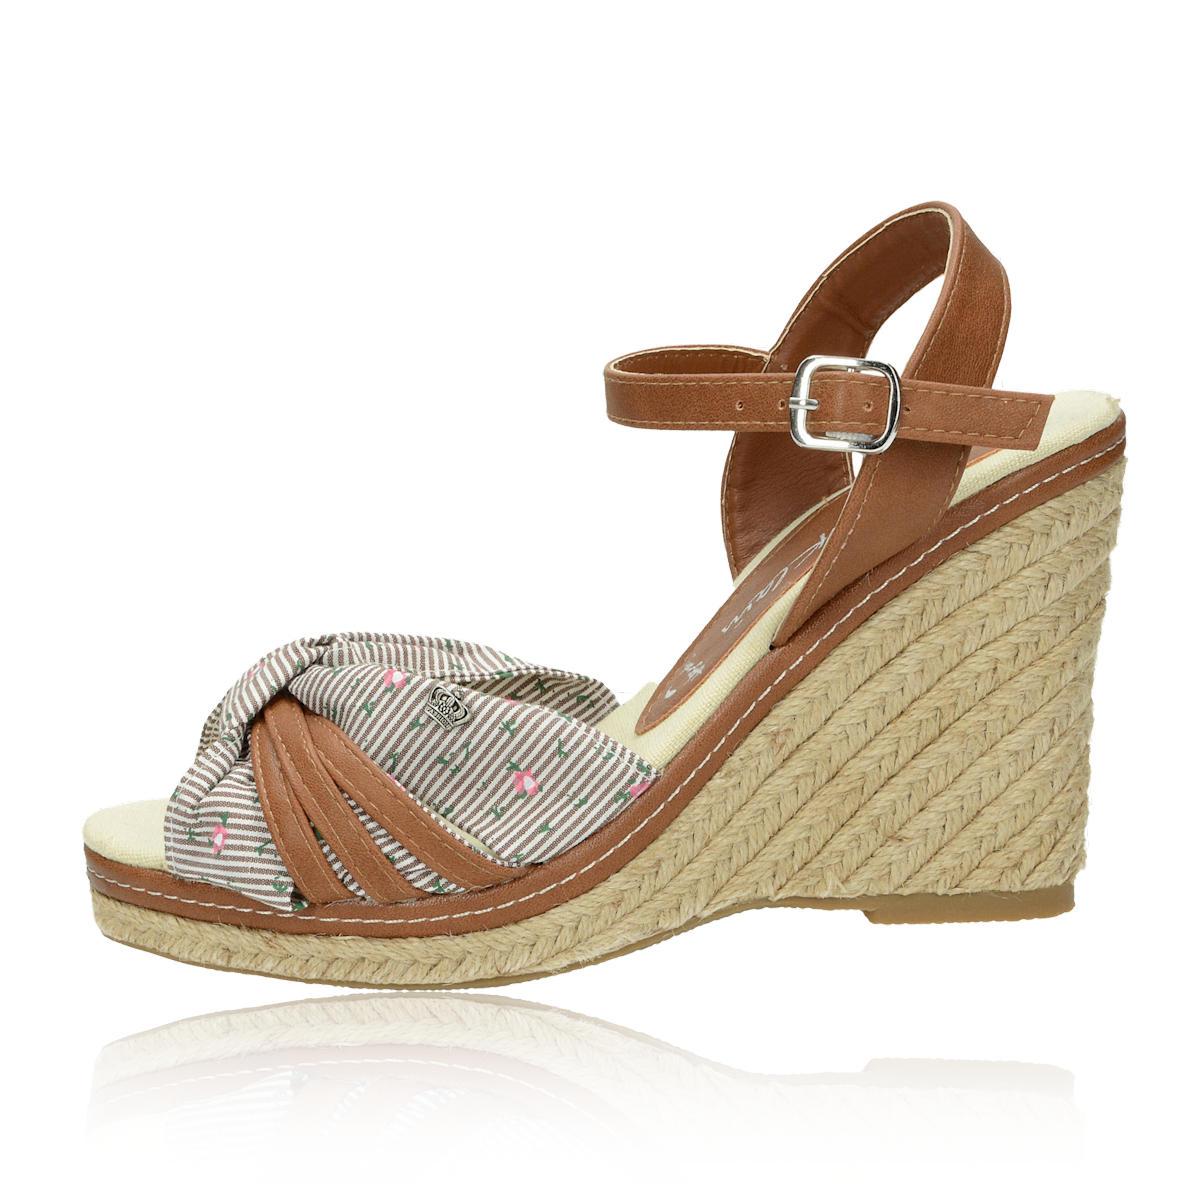 3667cbd094 ... Jane Klein dámske sandále - hnedé ...